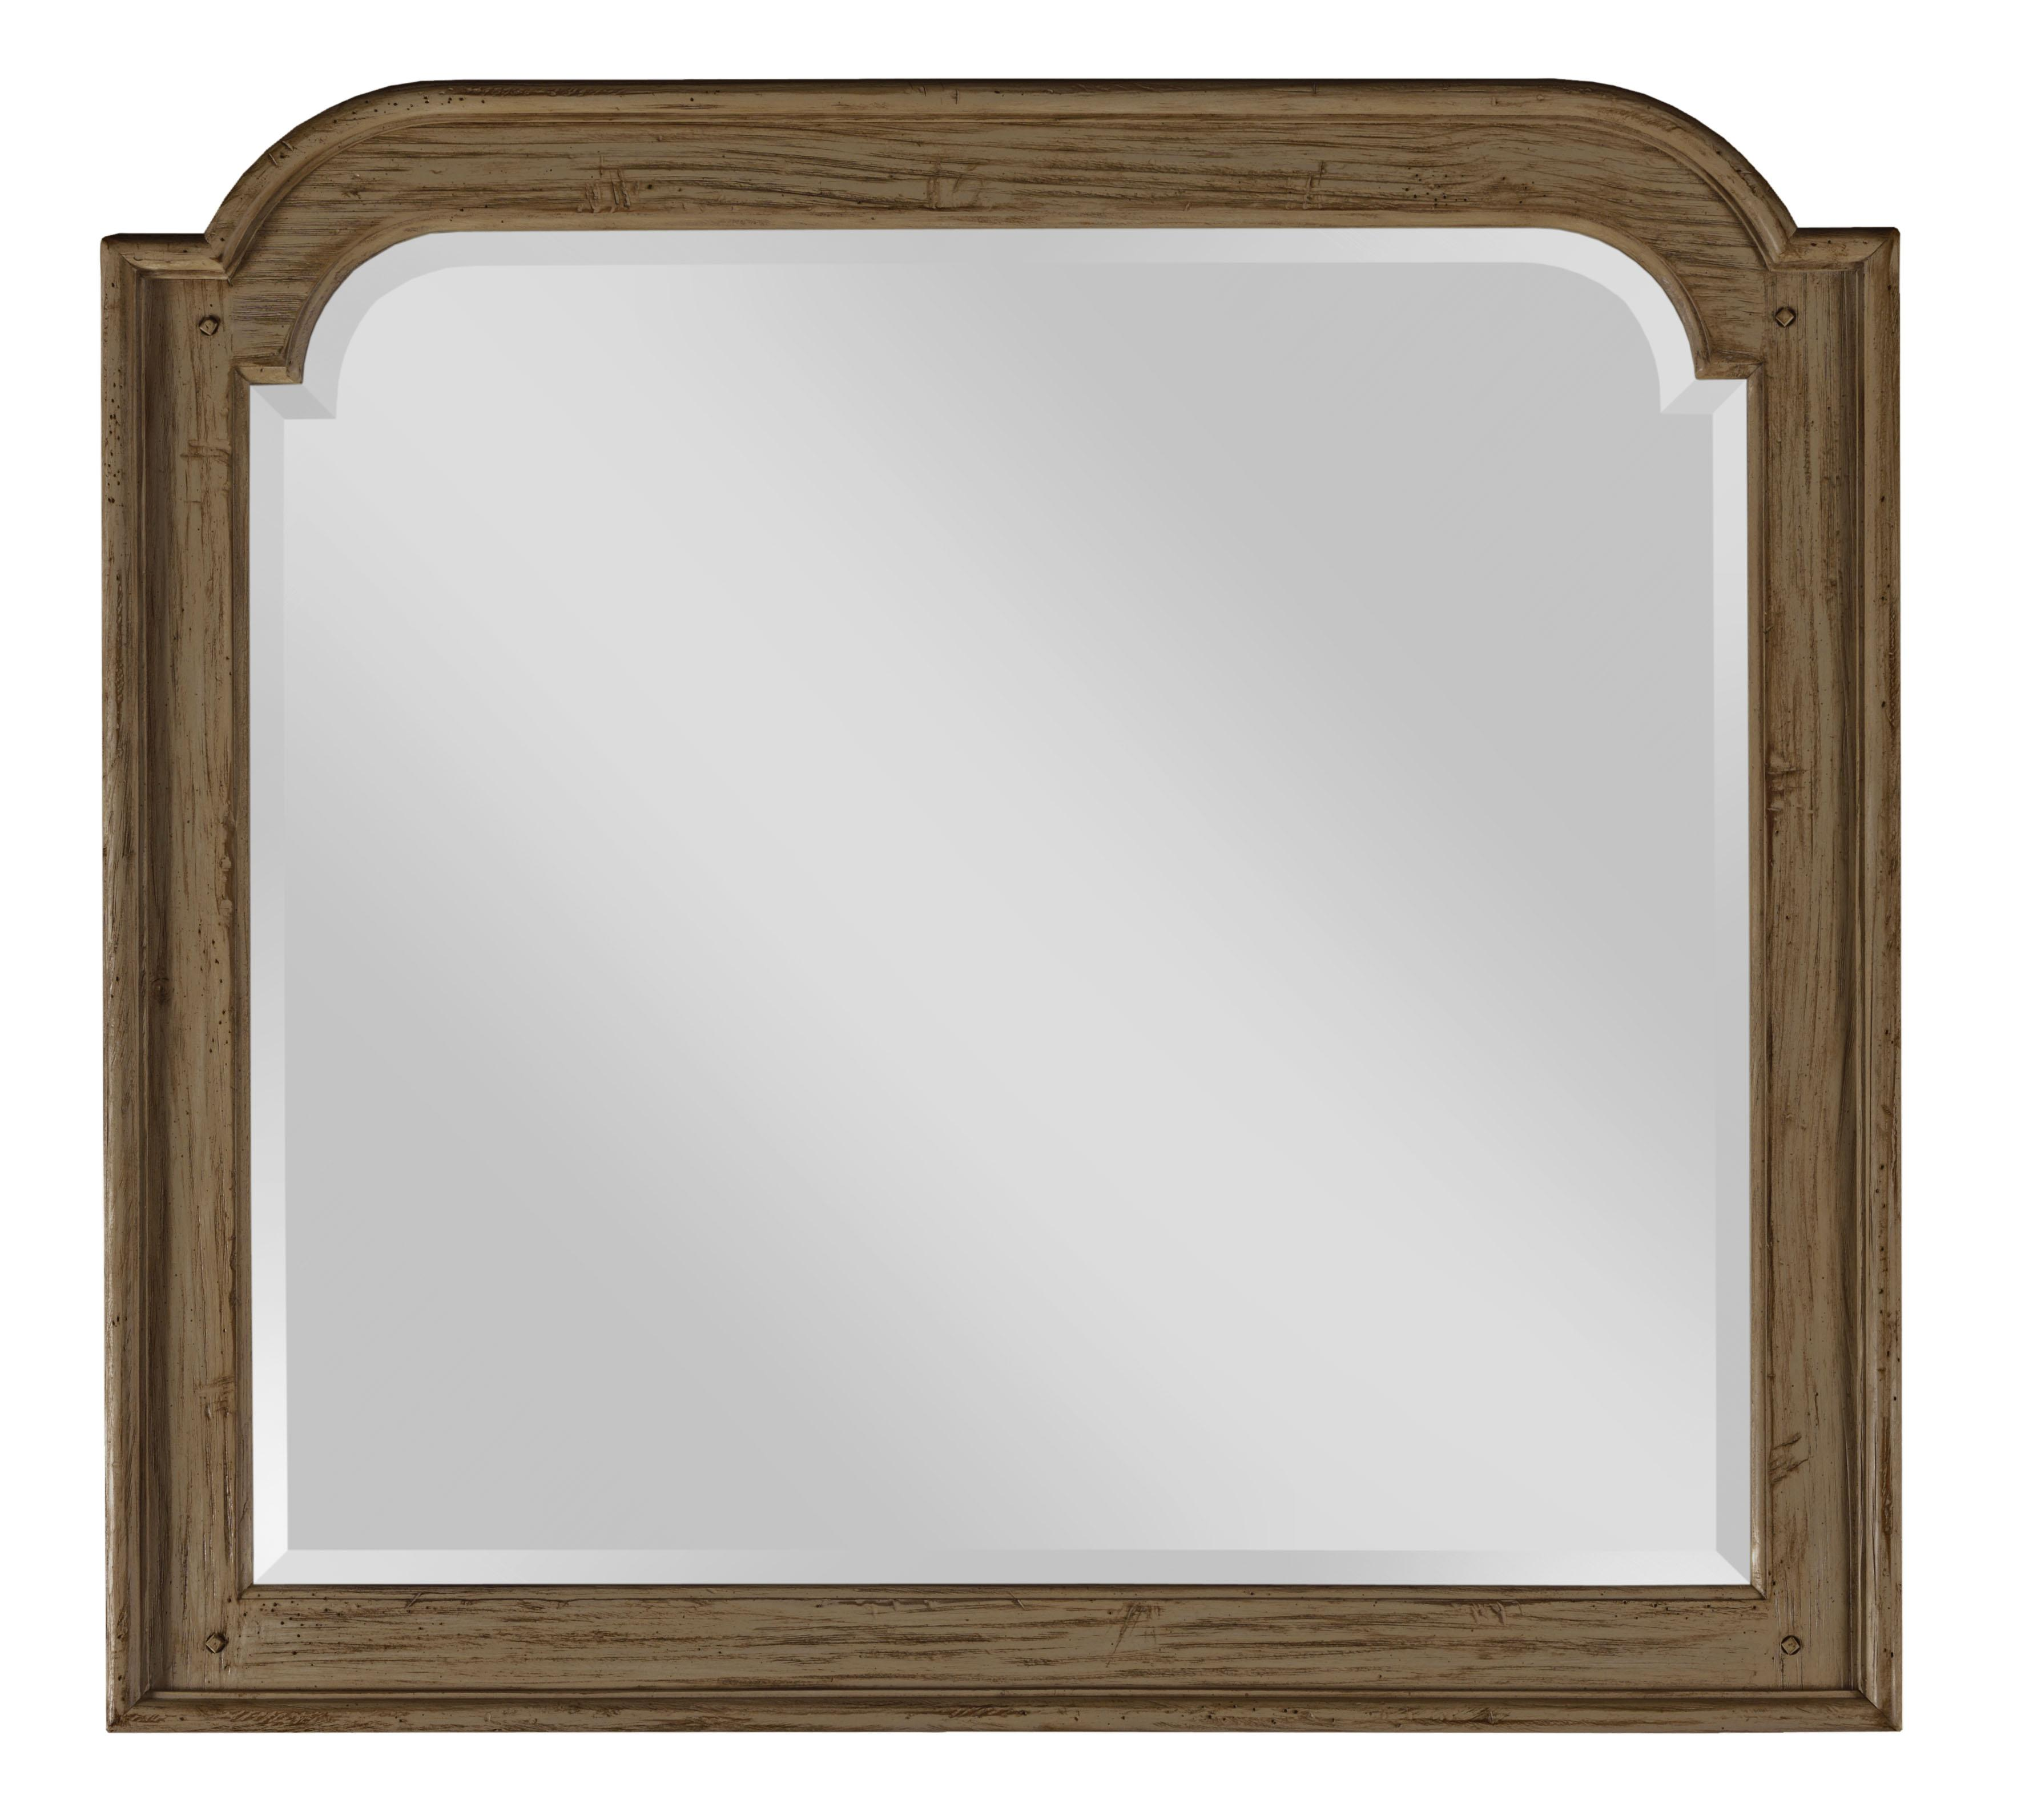 Kincaid Furniture Weatherford Westland Mirror - Item Number: 76-118